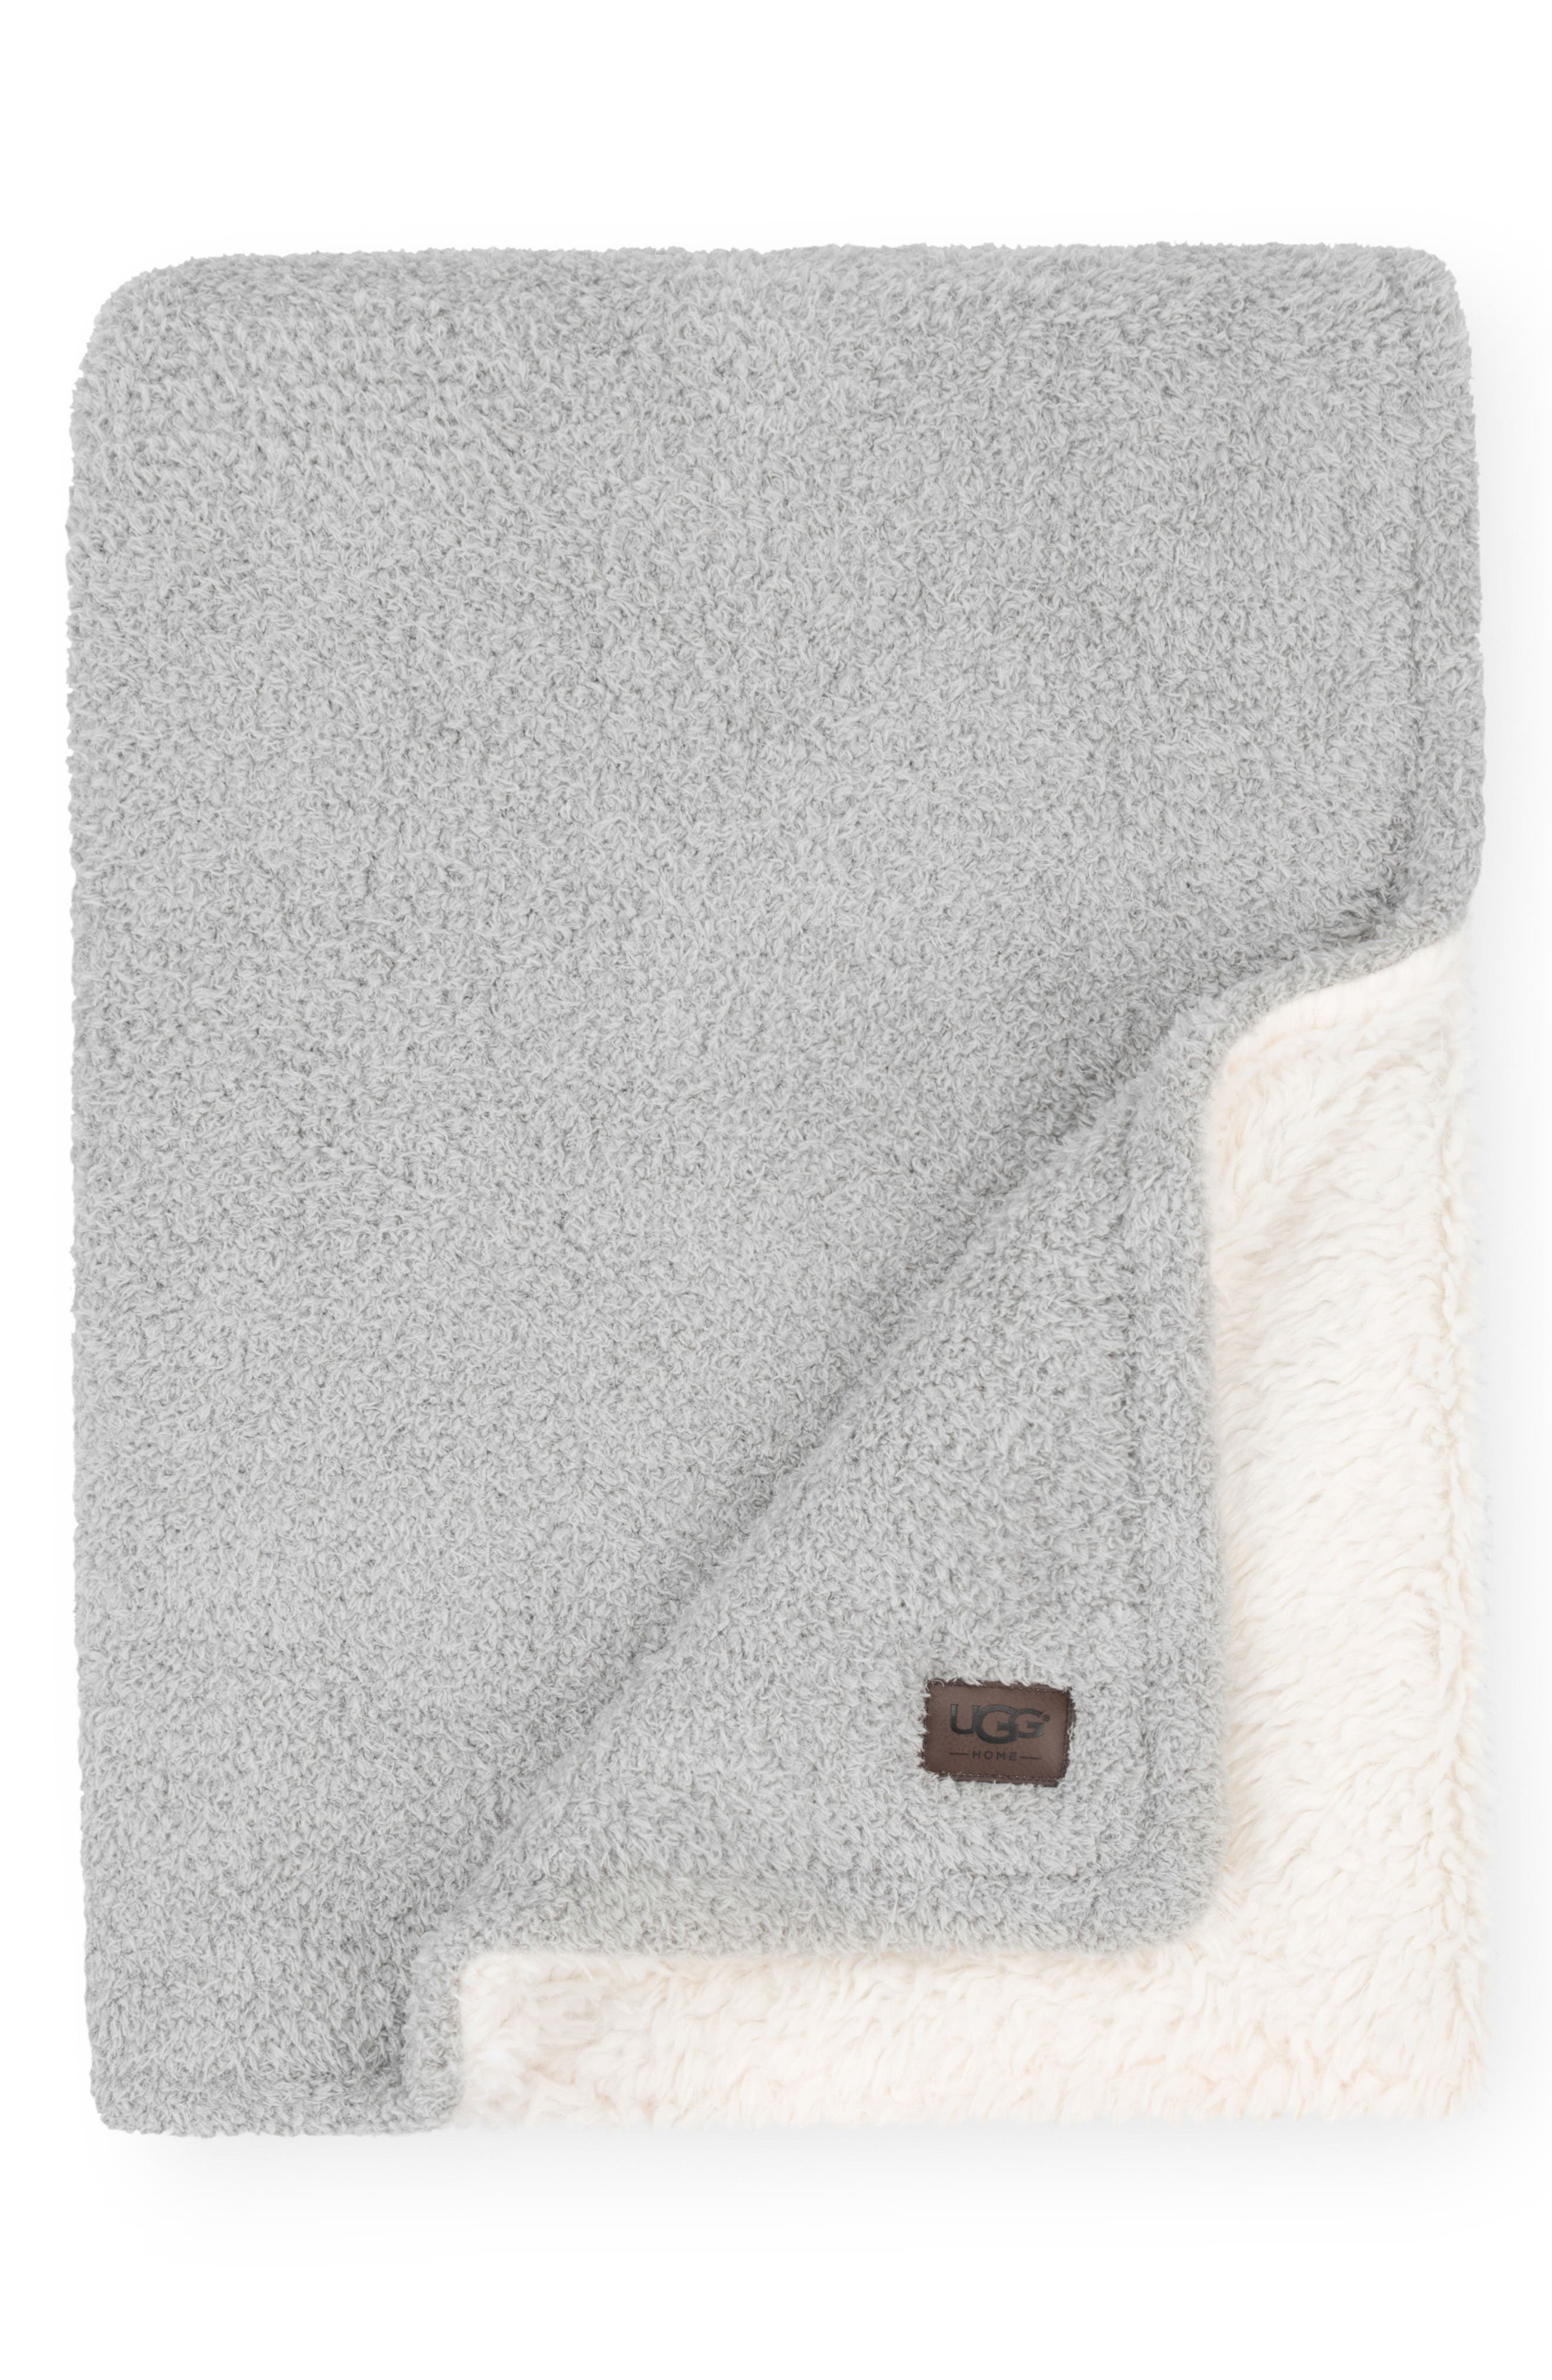 Ana Faux Shearling Throw,                         Main,                         color, Seal Grey